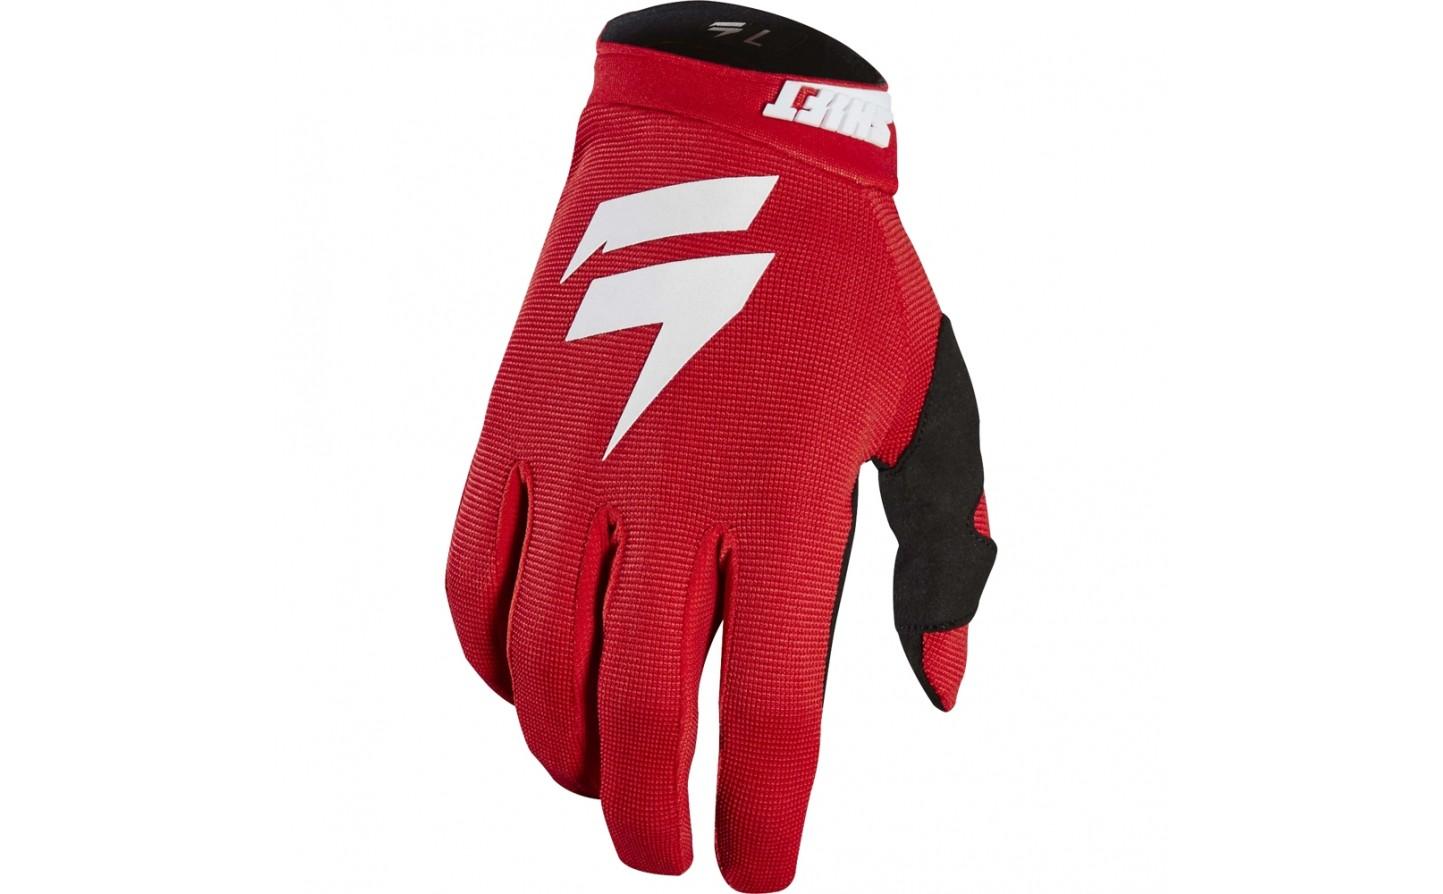 guante shift whit3 air glove rojo/blanco talle l